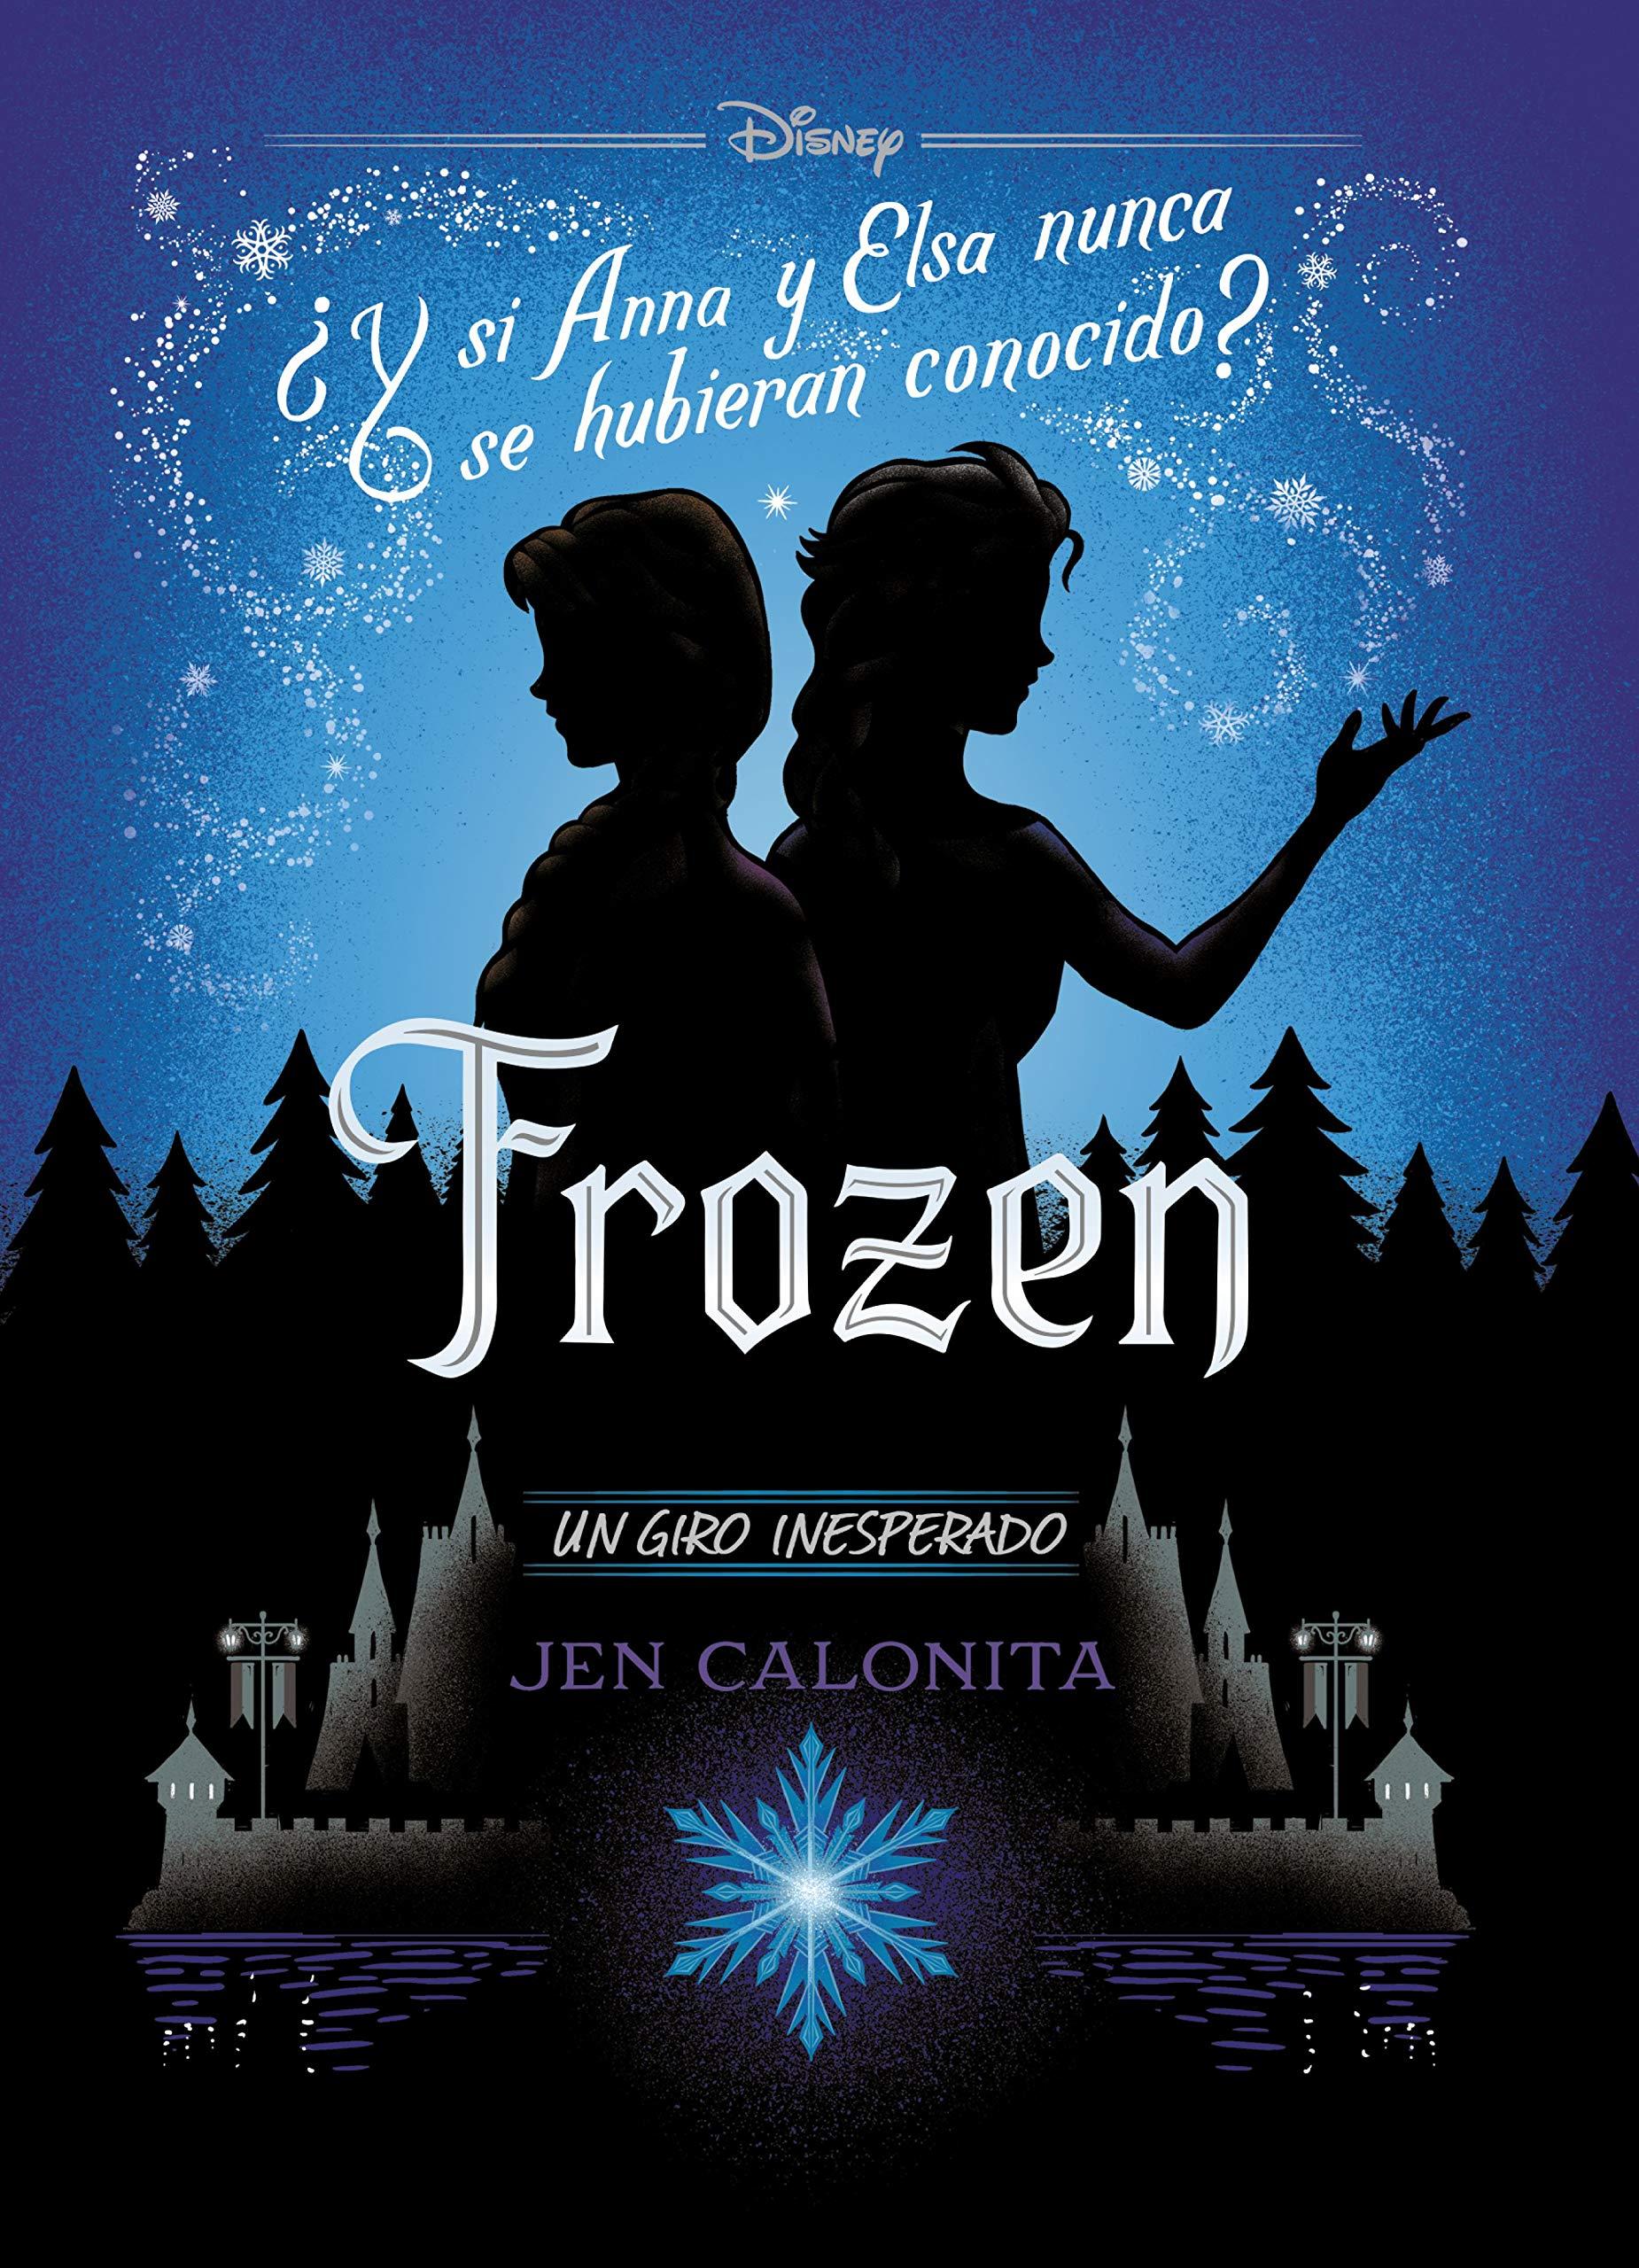 Frozen un giro inesperado